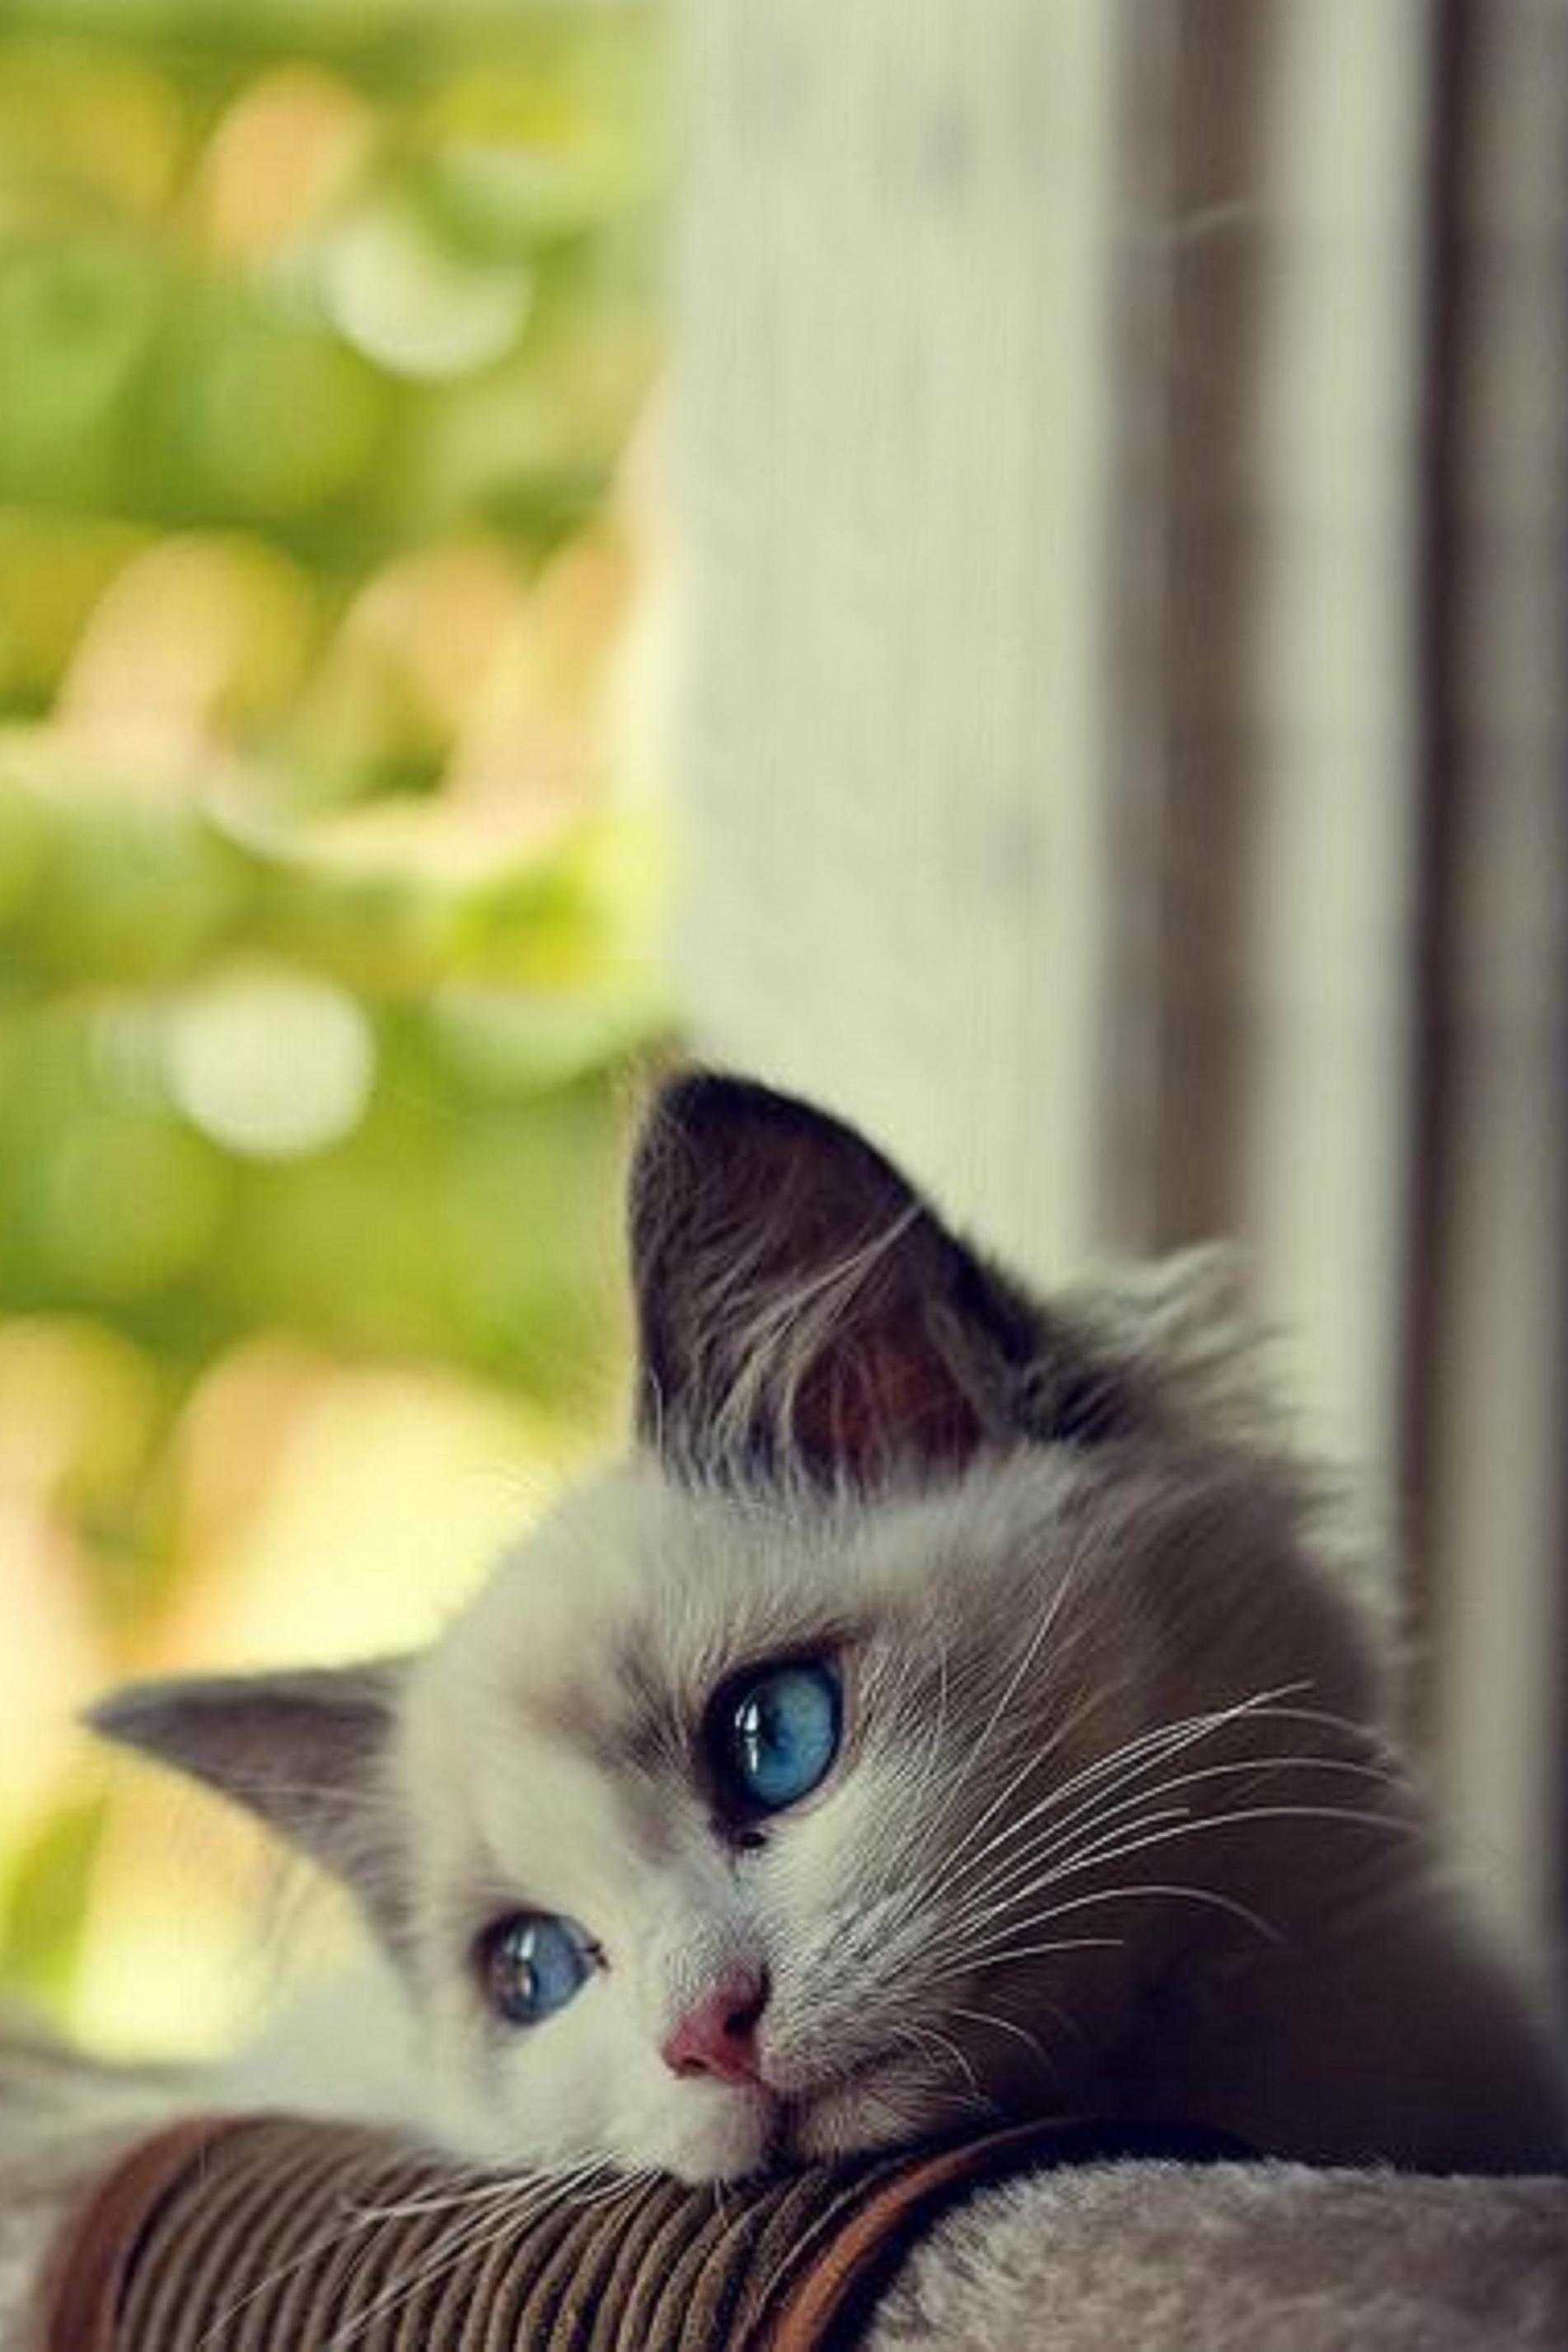 Cute Cat Wallpapers Kitten Cute Kitten Bored Android Wallpaper